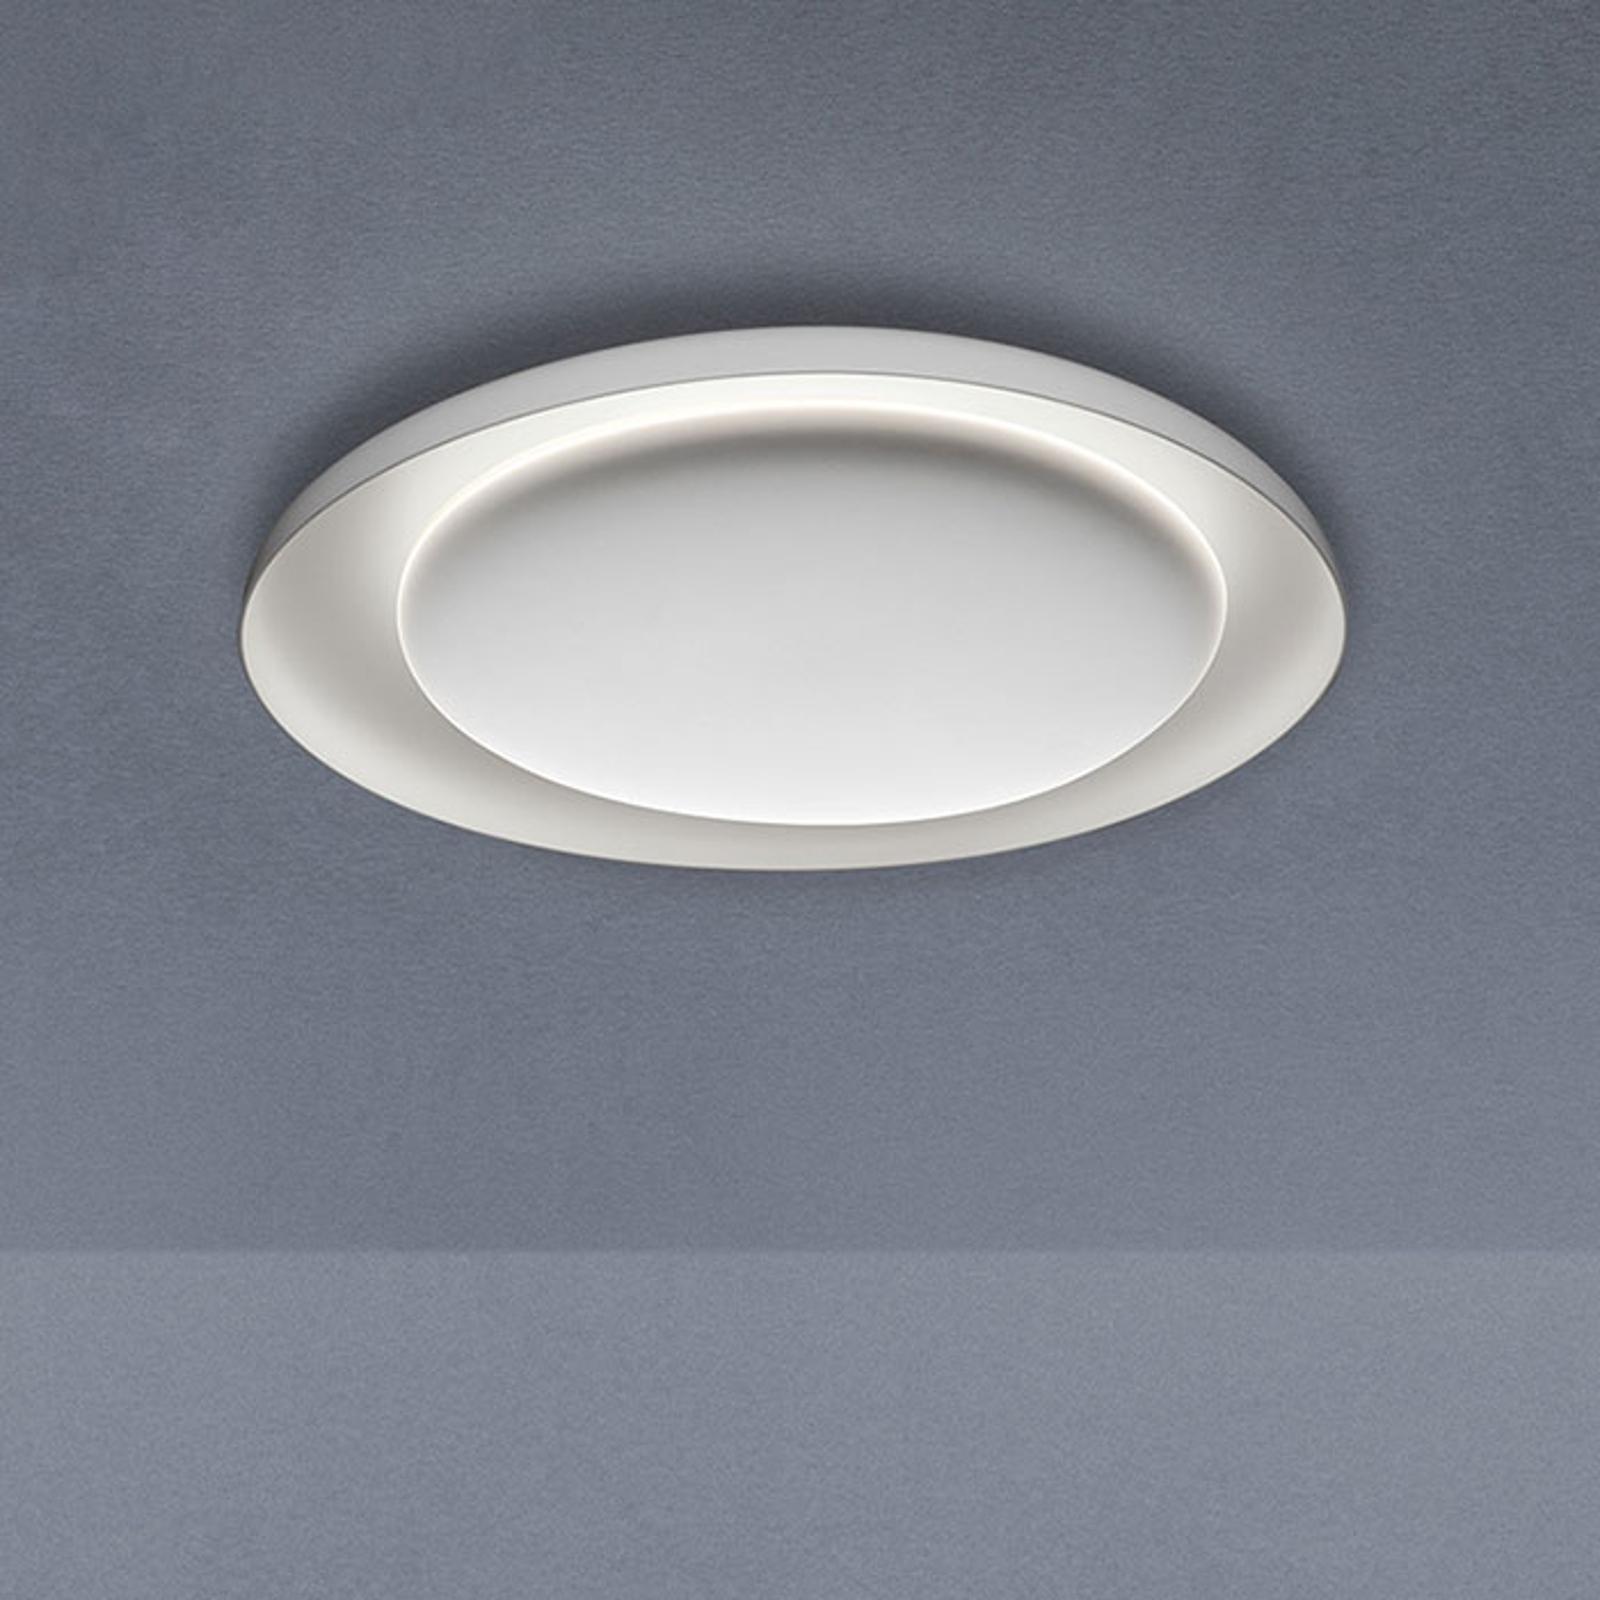 Foscarini Bahia Mini LED-Deckenlampe dimmbar, 55cm